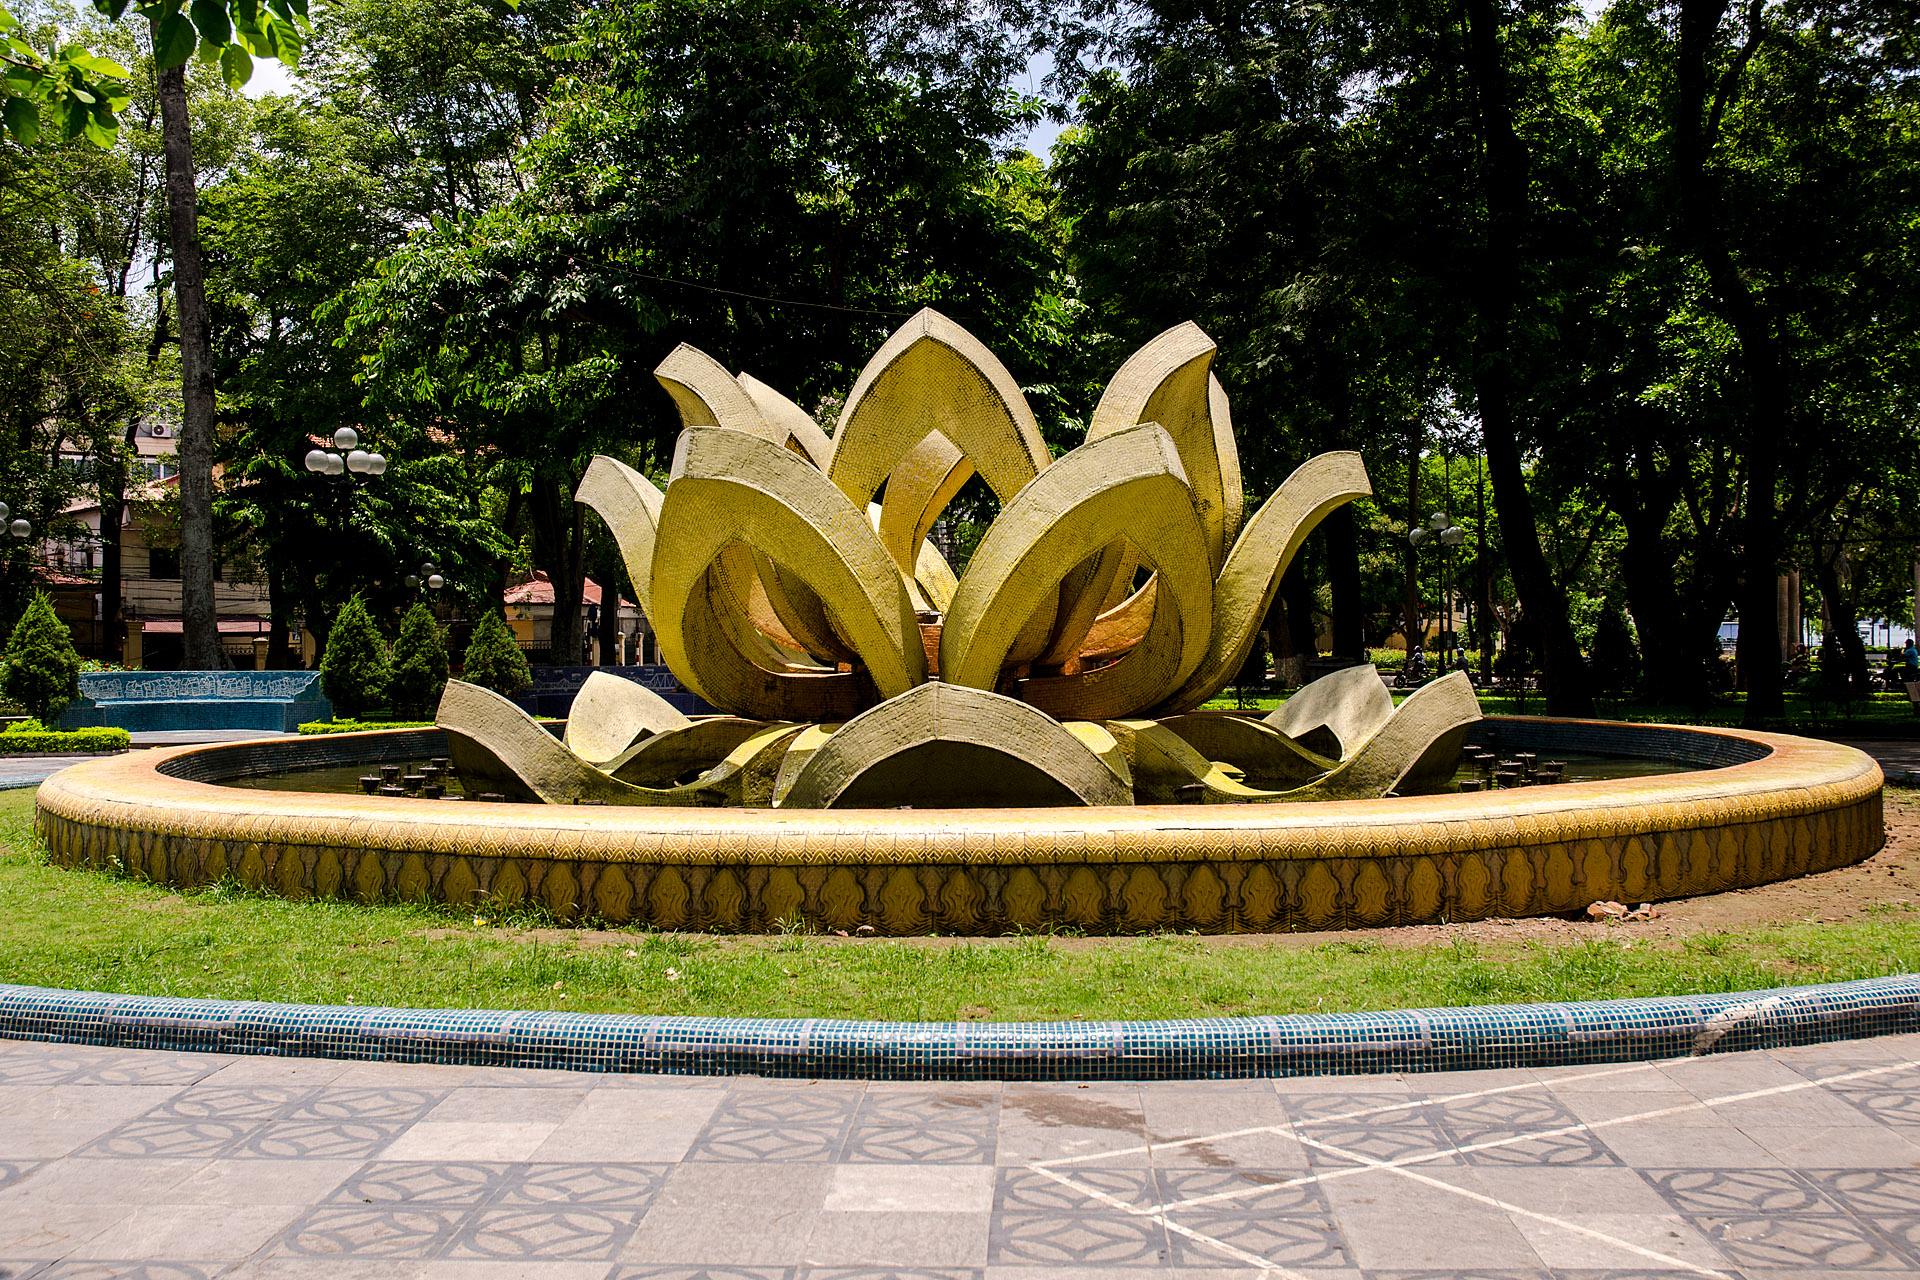 Mai Xuan Thuong Park